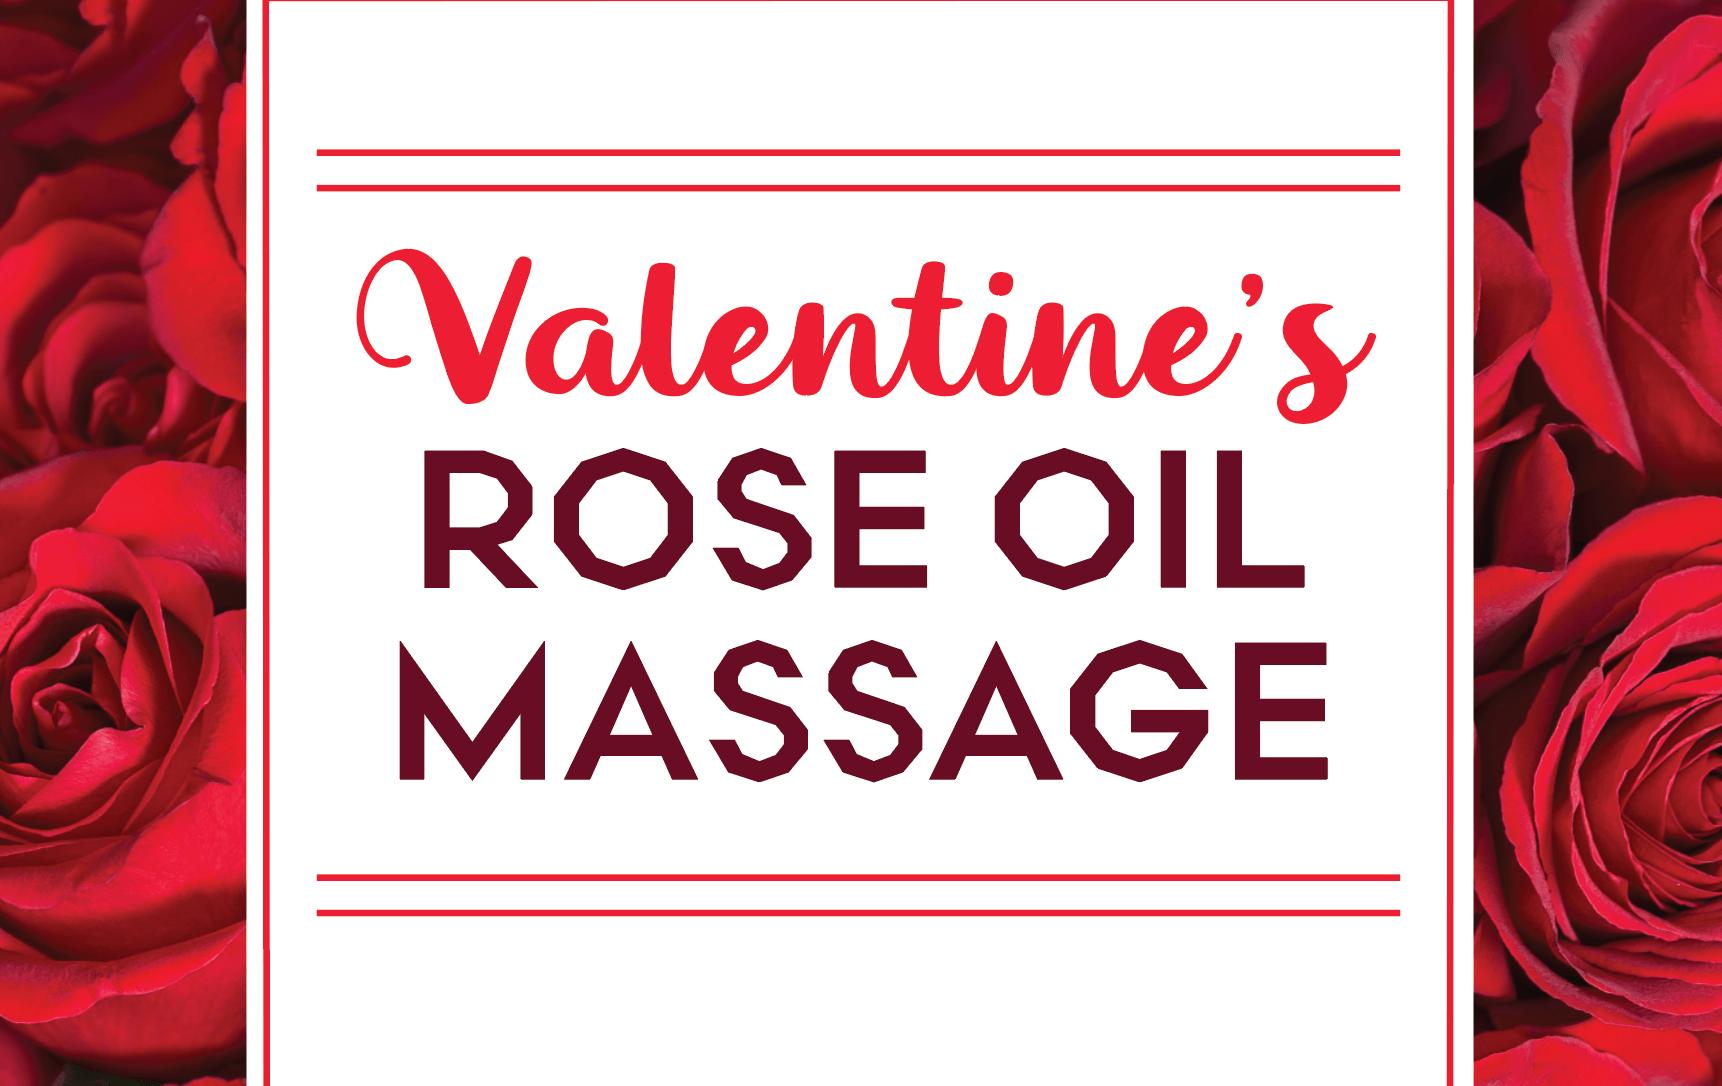 Valentine's Day Rose Oil Massage Treatment Spa Promo